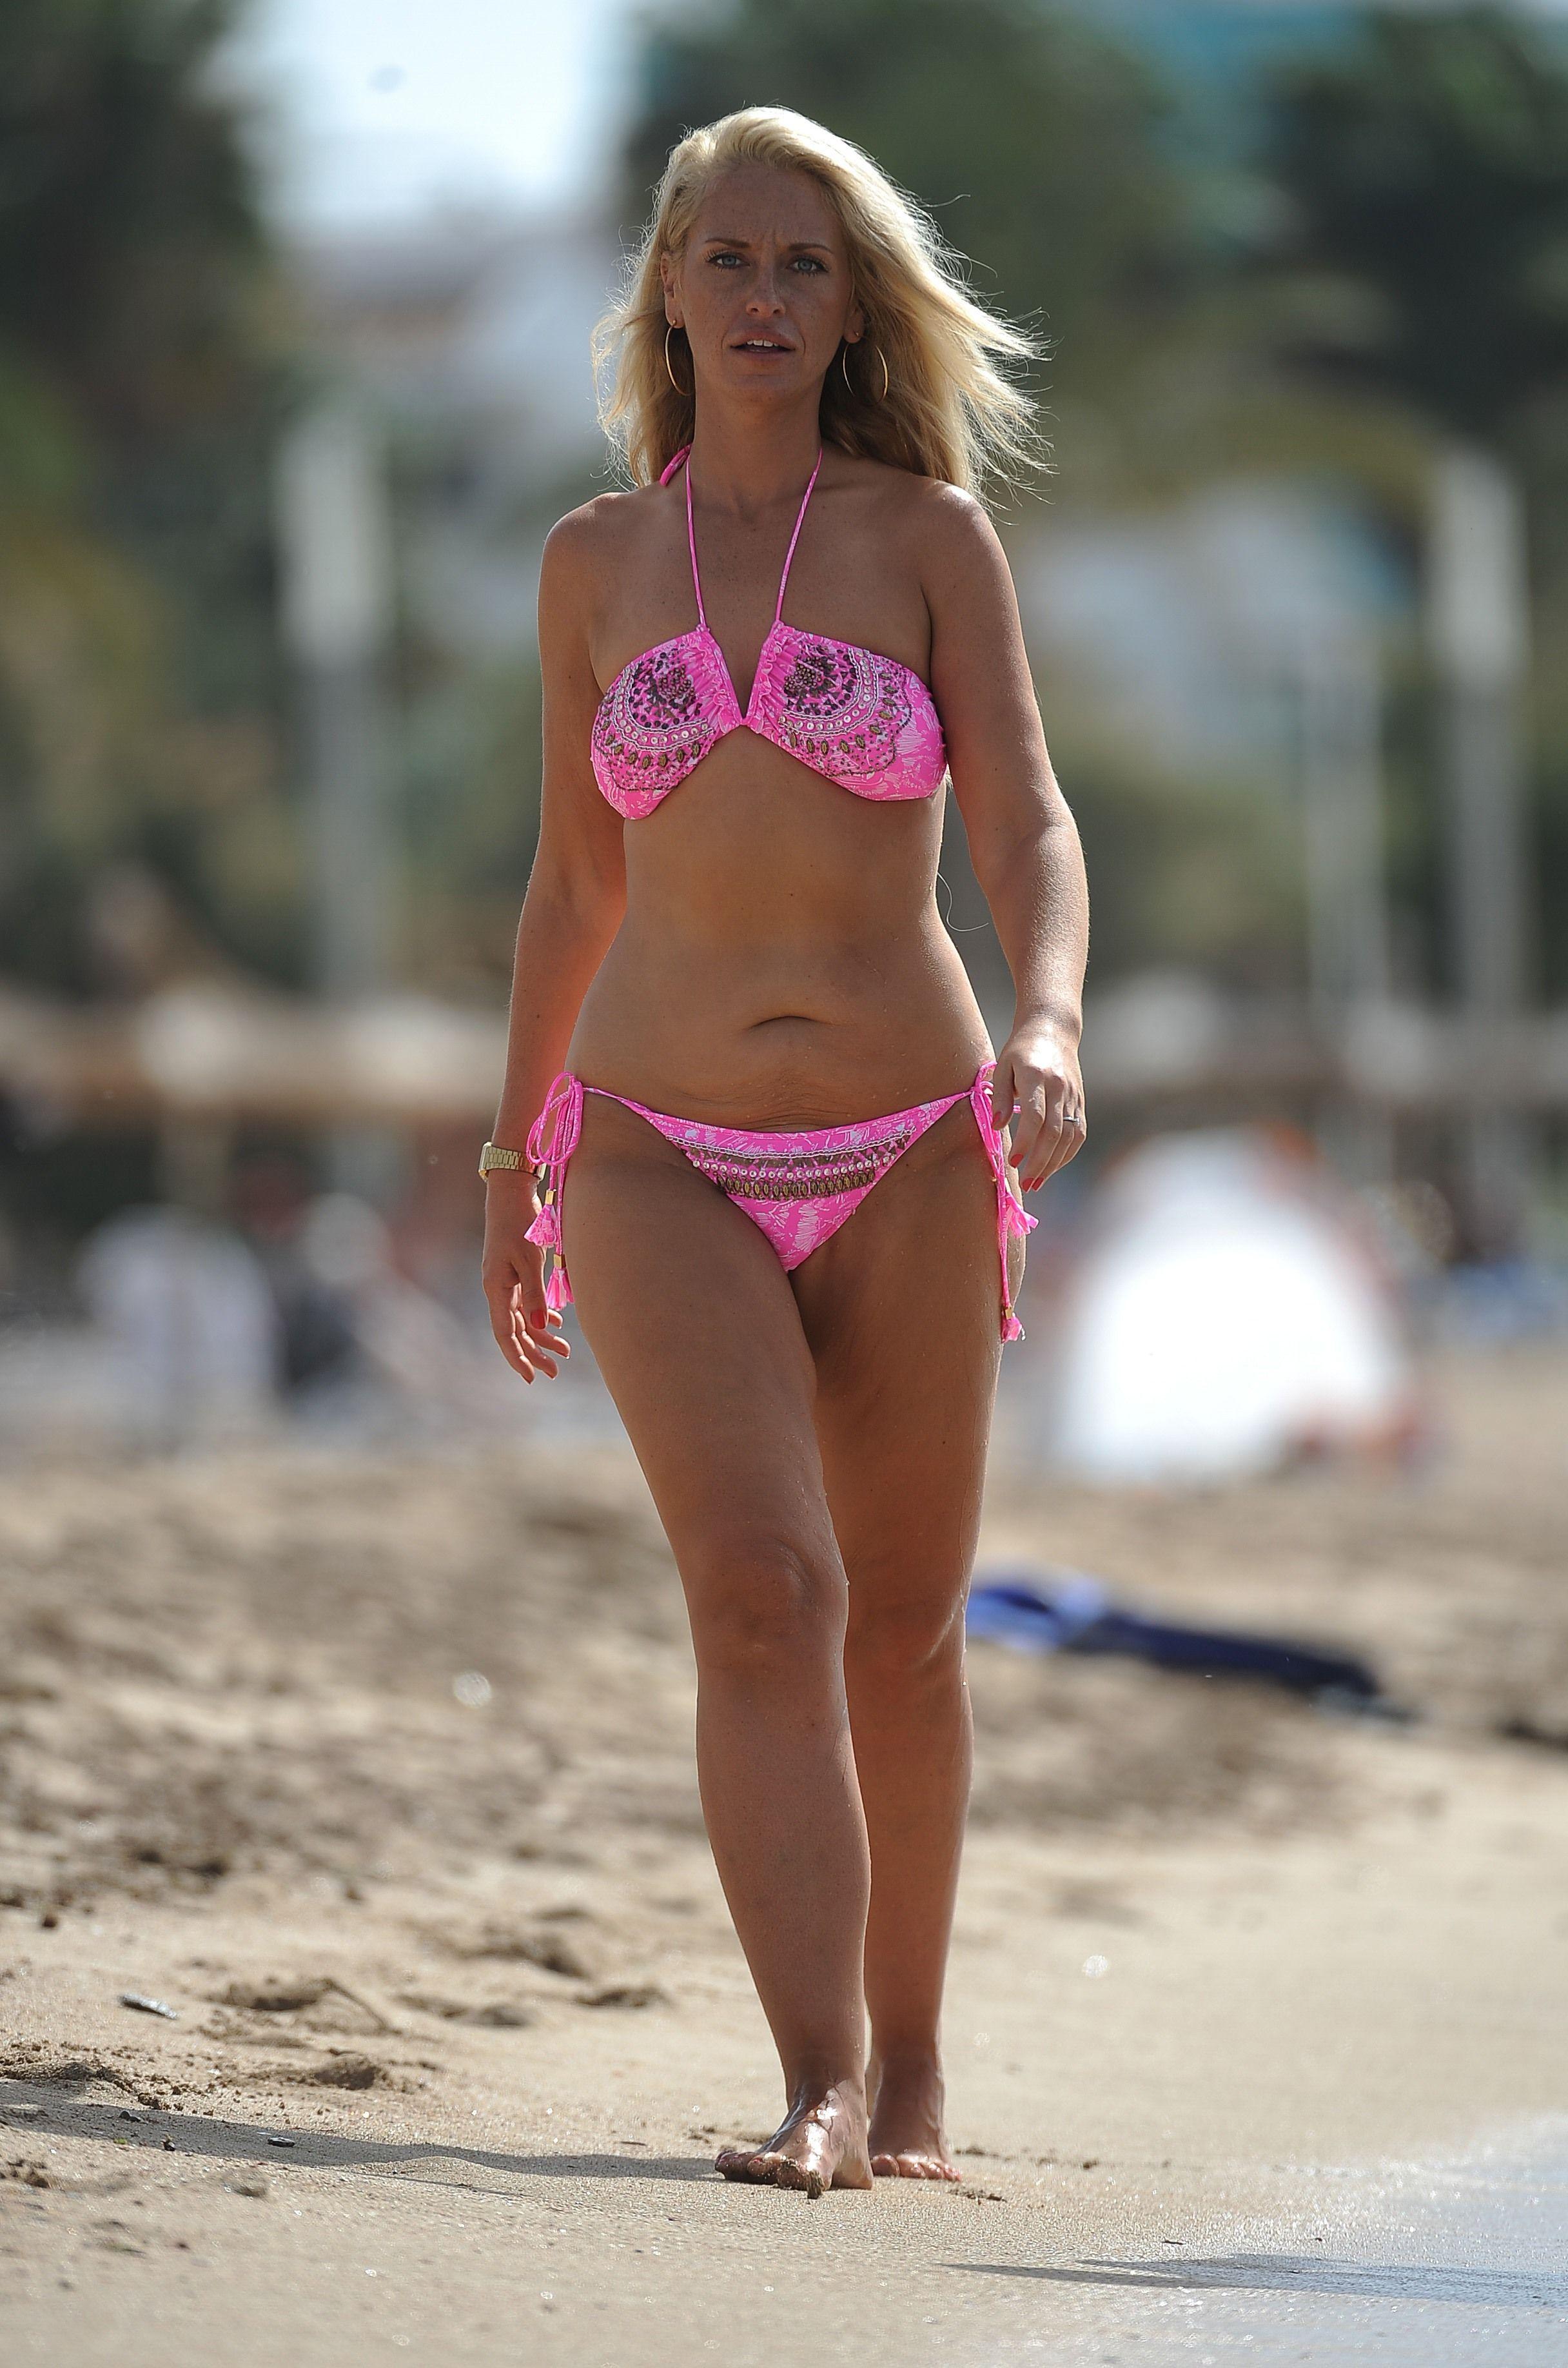 Bikini Josie Gibson nudes (24 foto and video), Sexy, Paparazzi, Twitter, braless 2006